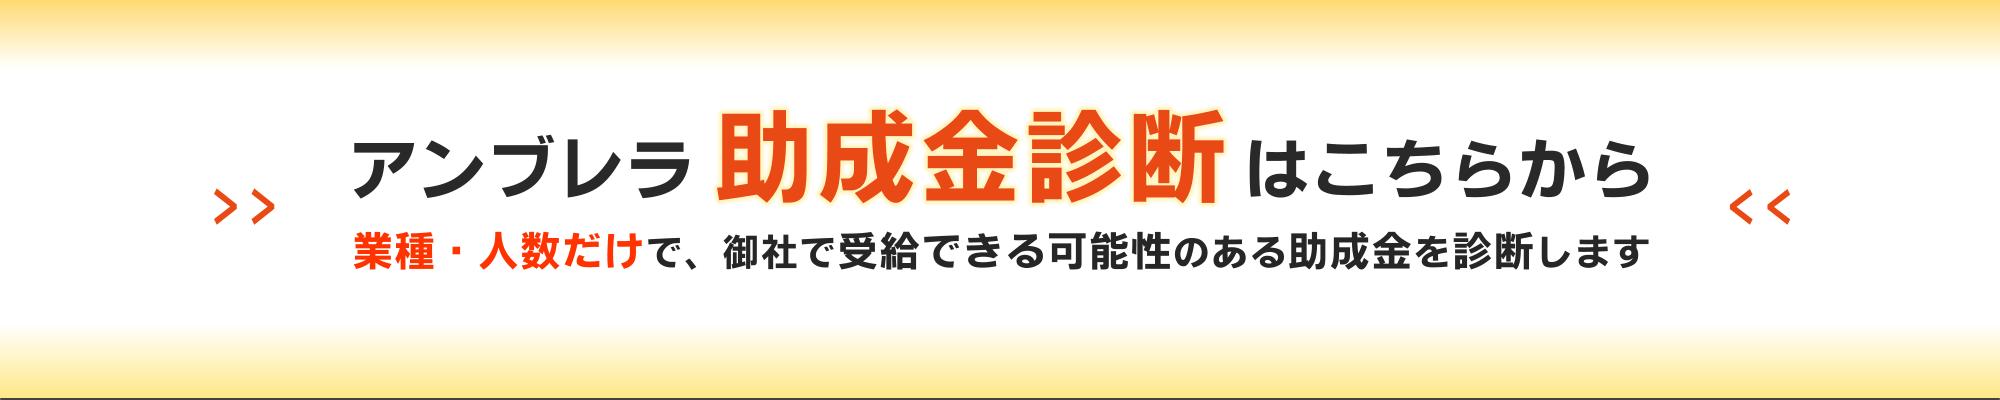 umbrella 助成金診断バナー